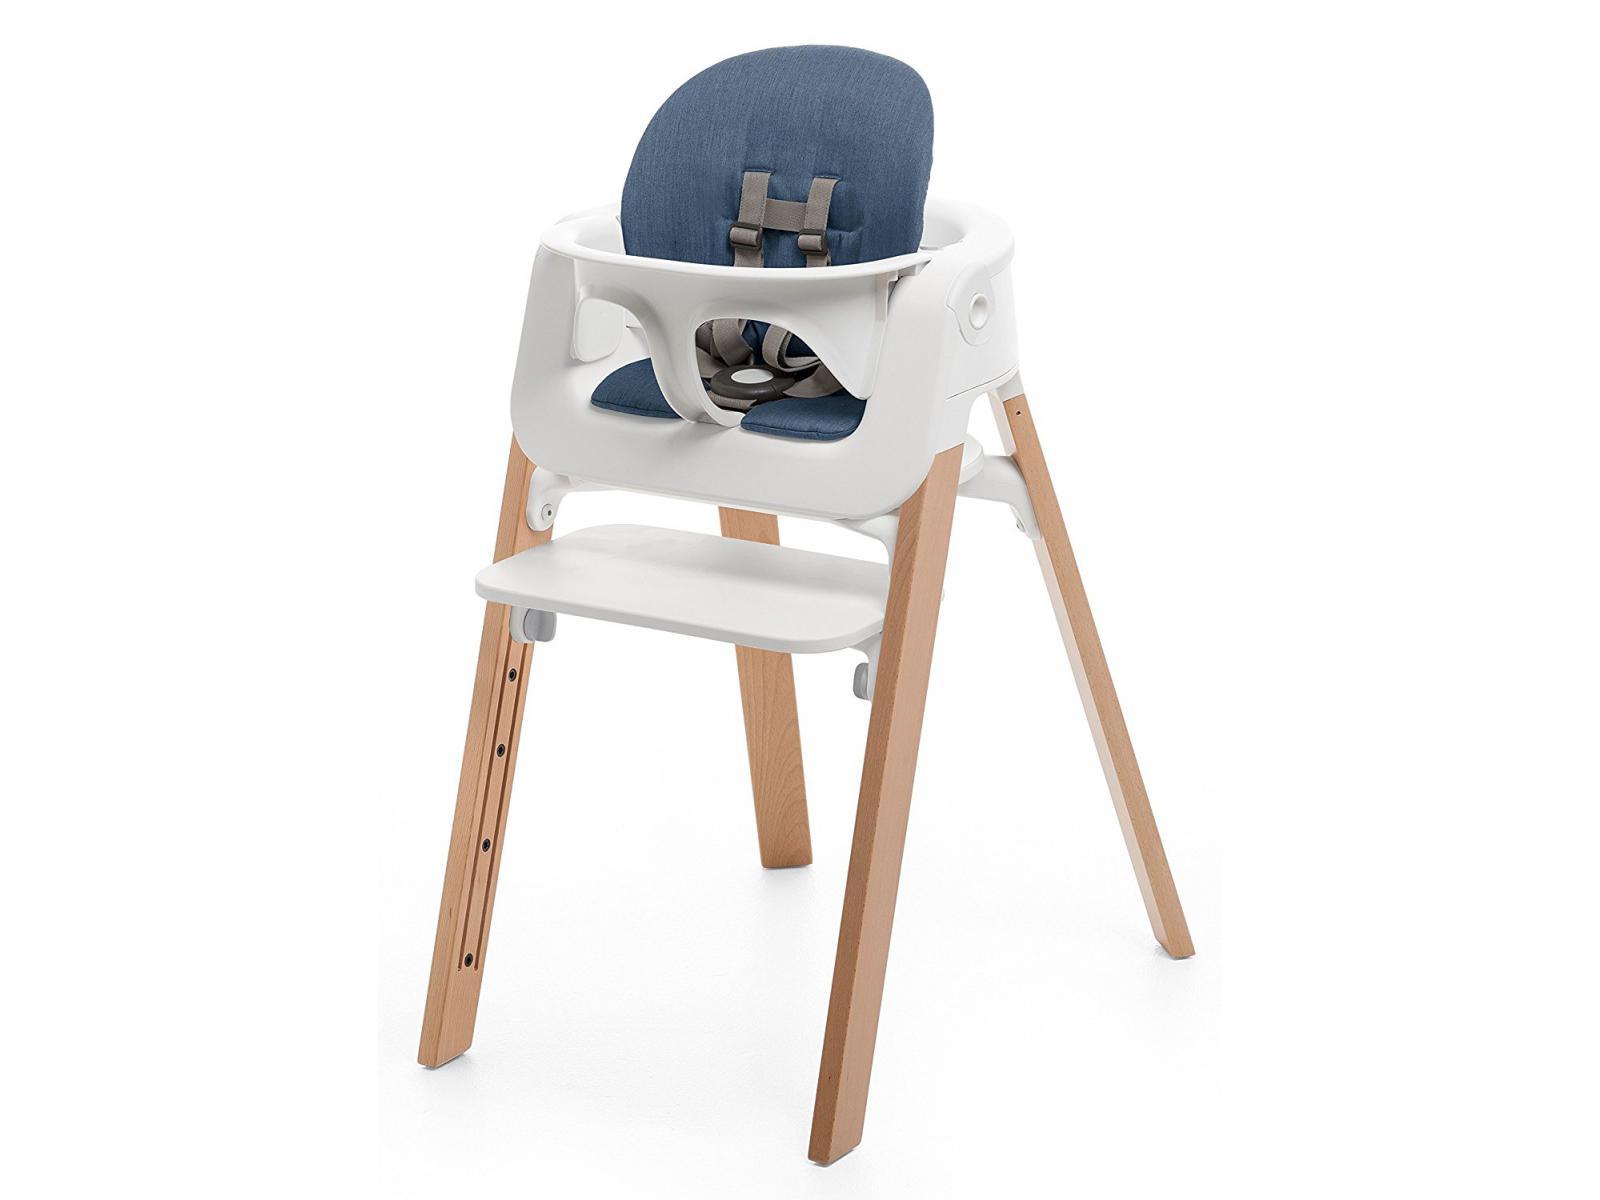 stokke coussin rouge pour chaise haute steps. Black Bedroom Furniture Sets. Home Design Ideas